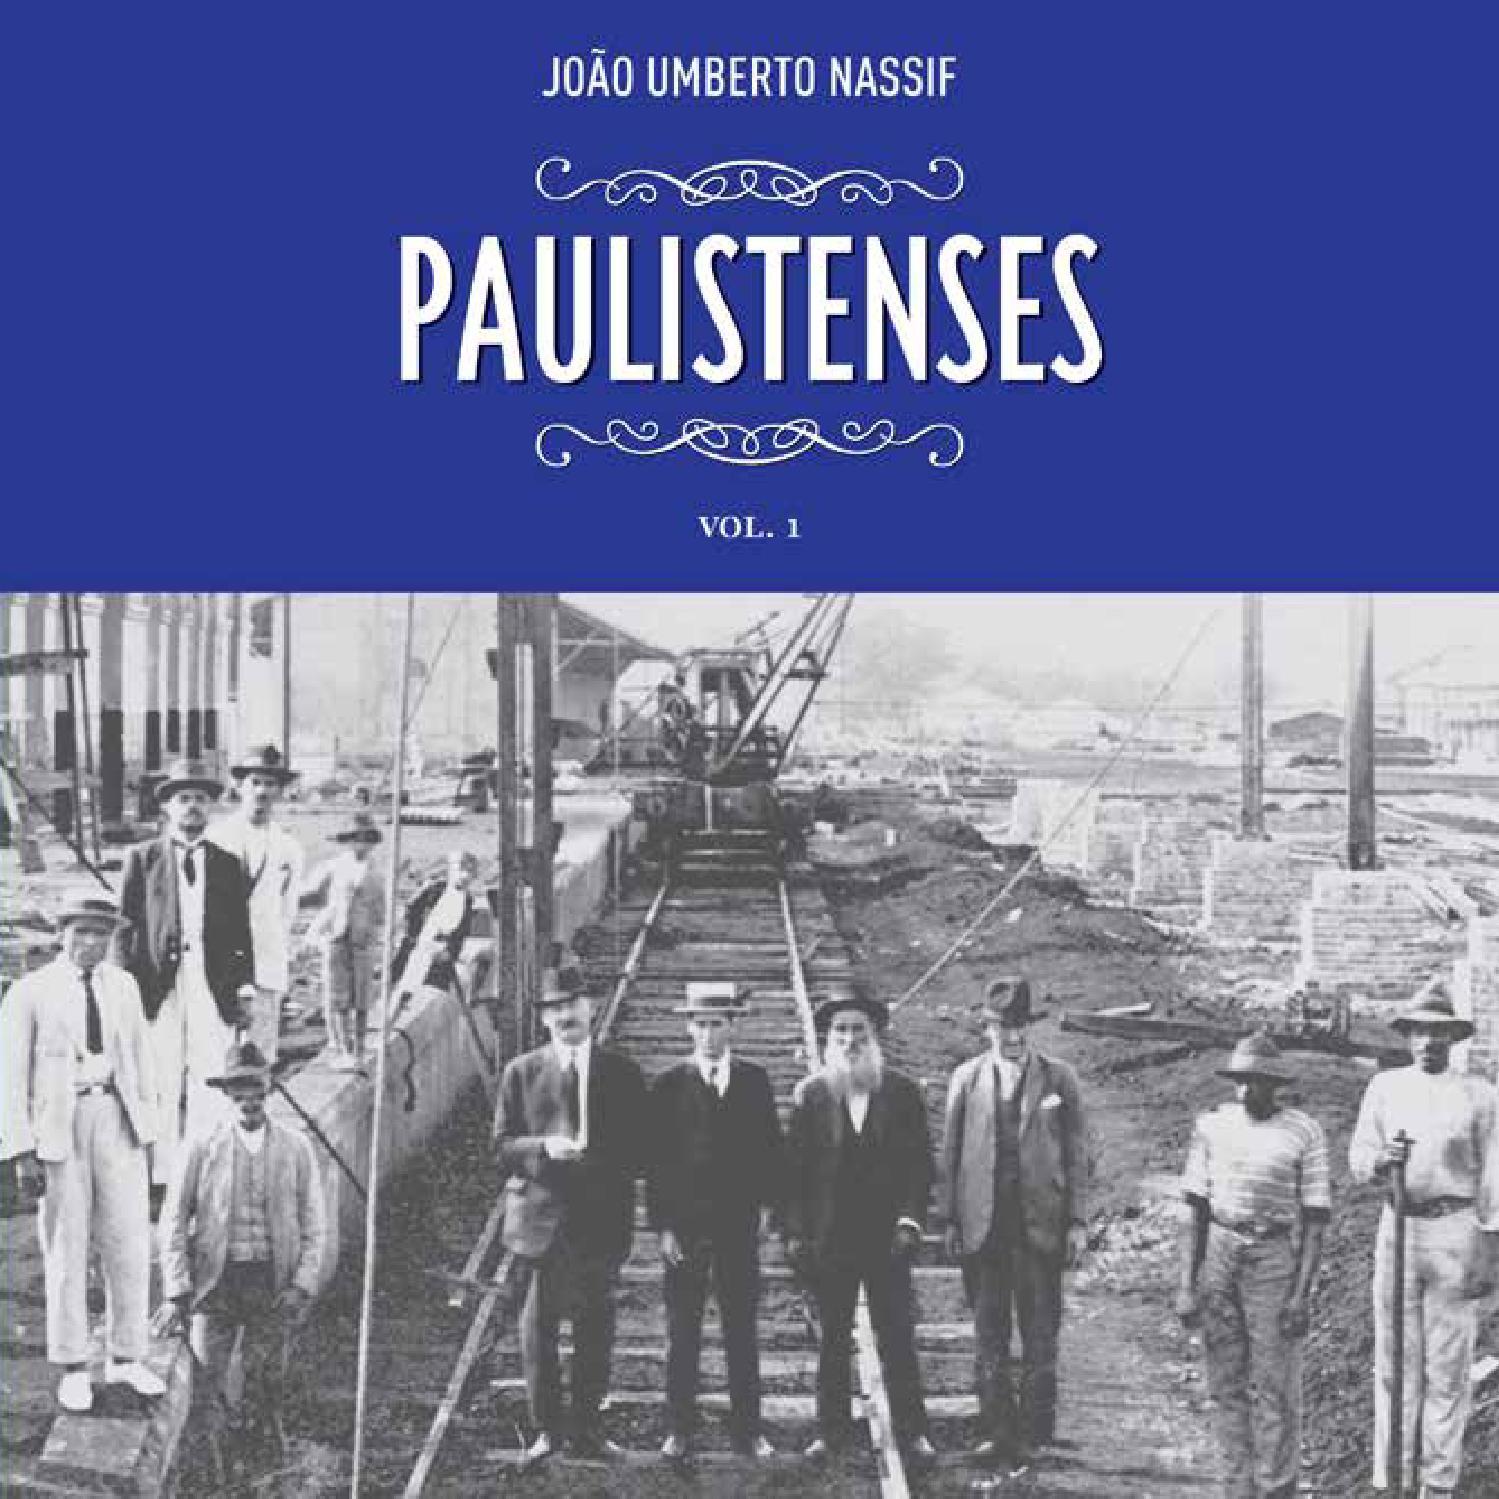 3540dbb317305 Paulistenses Volume 1 by Instituto Histórico e Gográfico de Piracicaba -  issuu